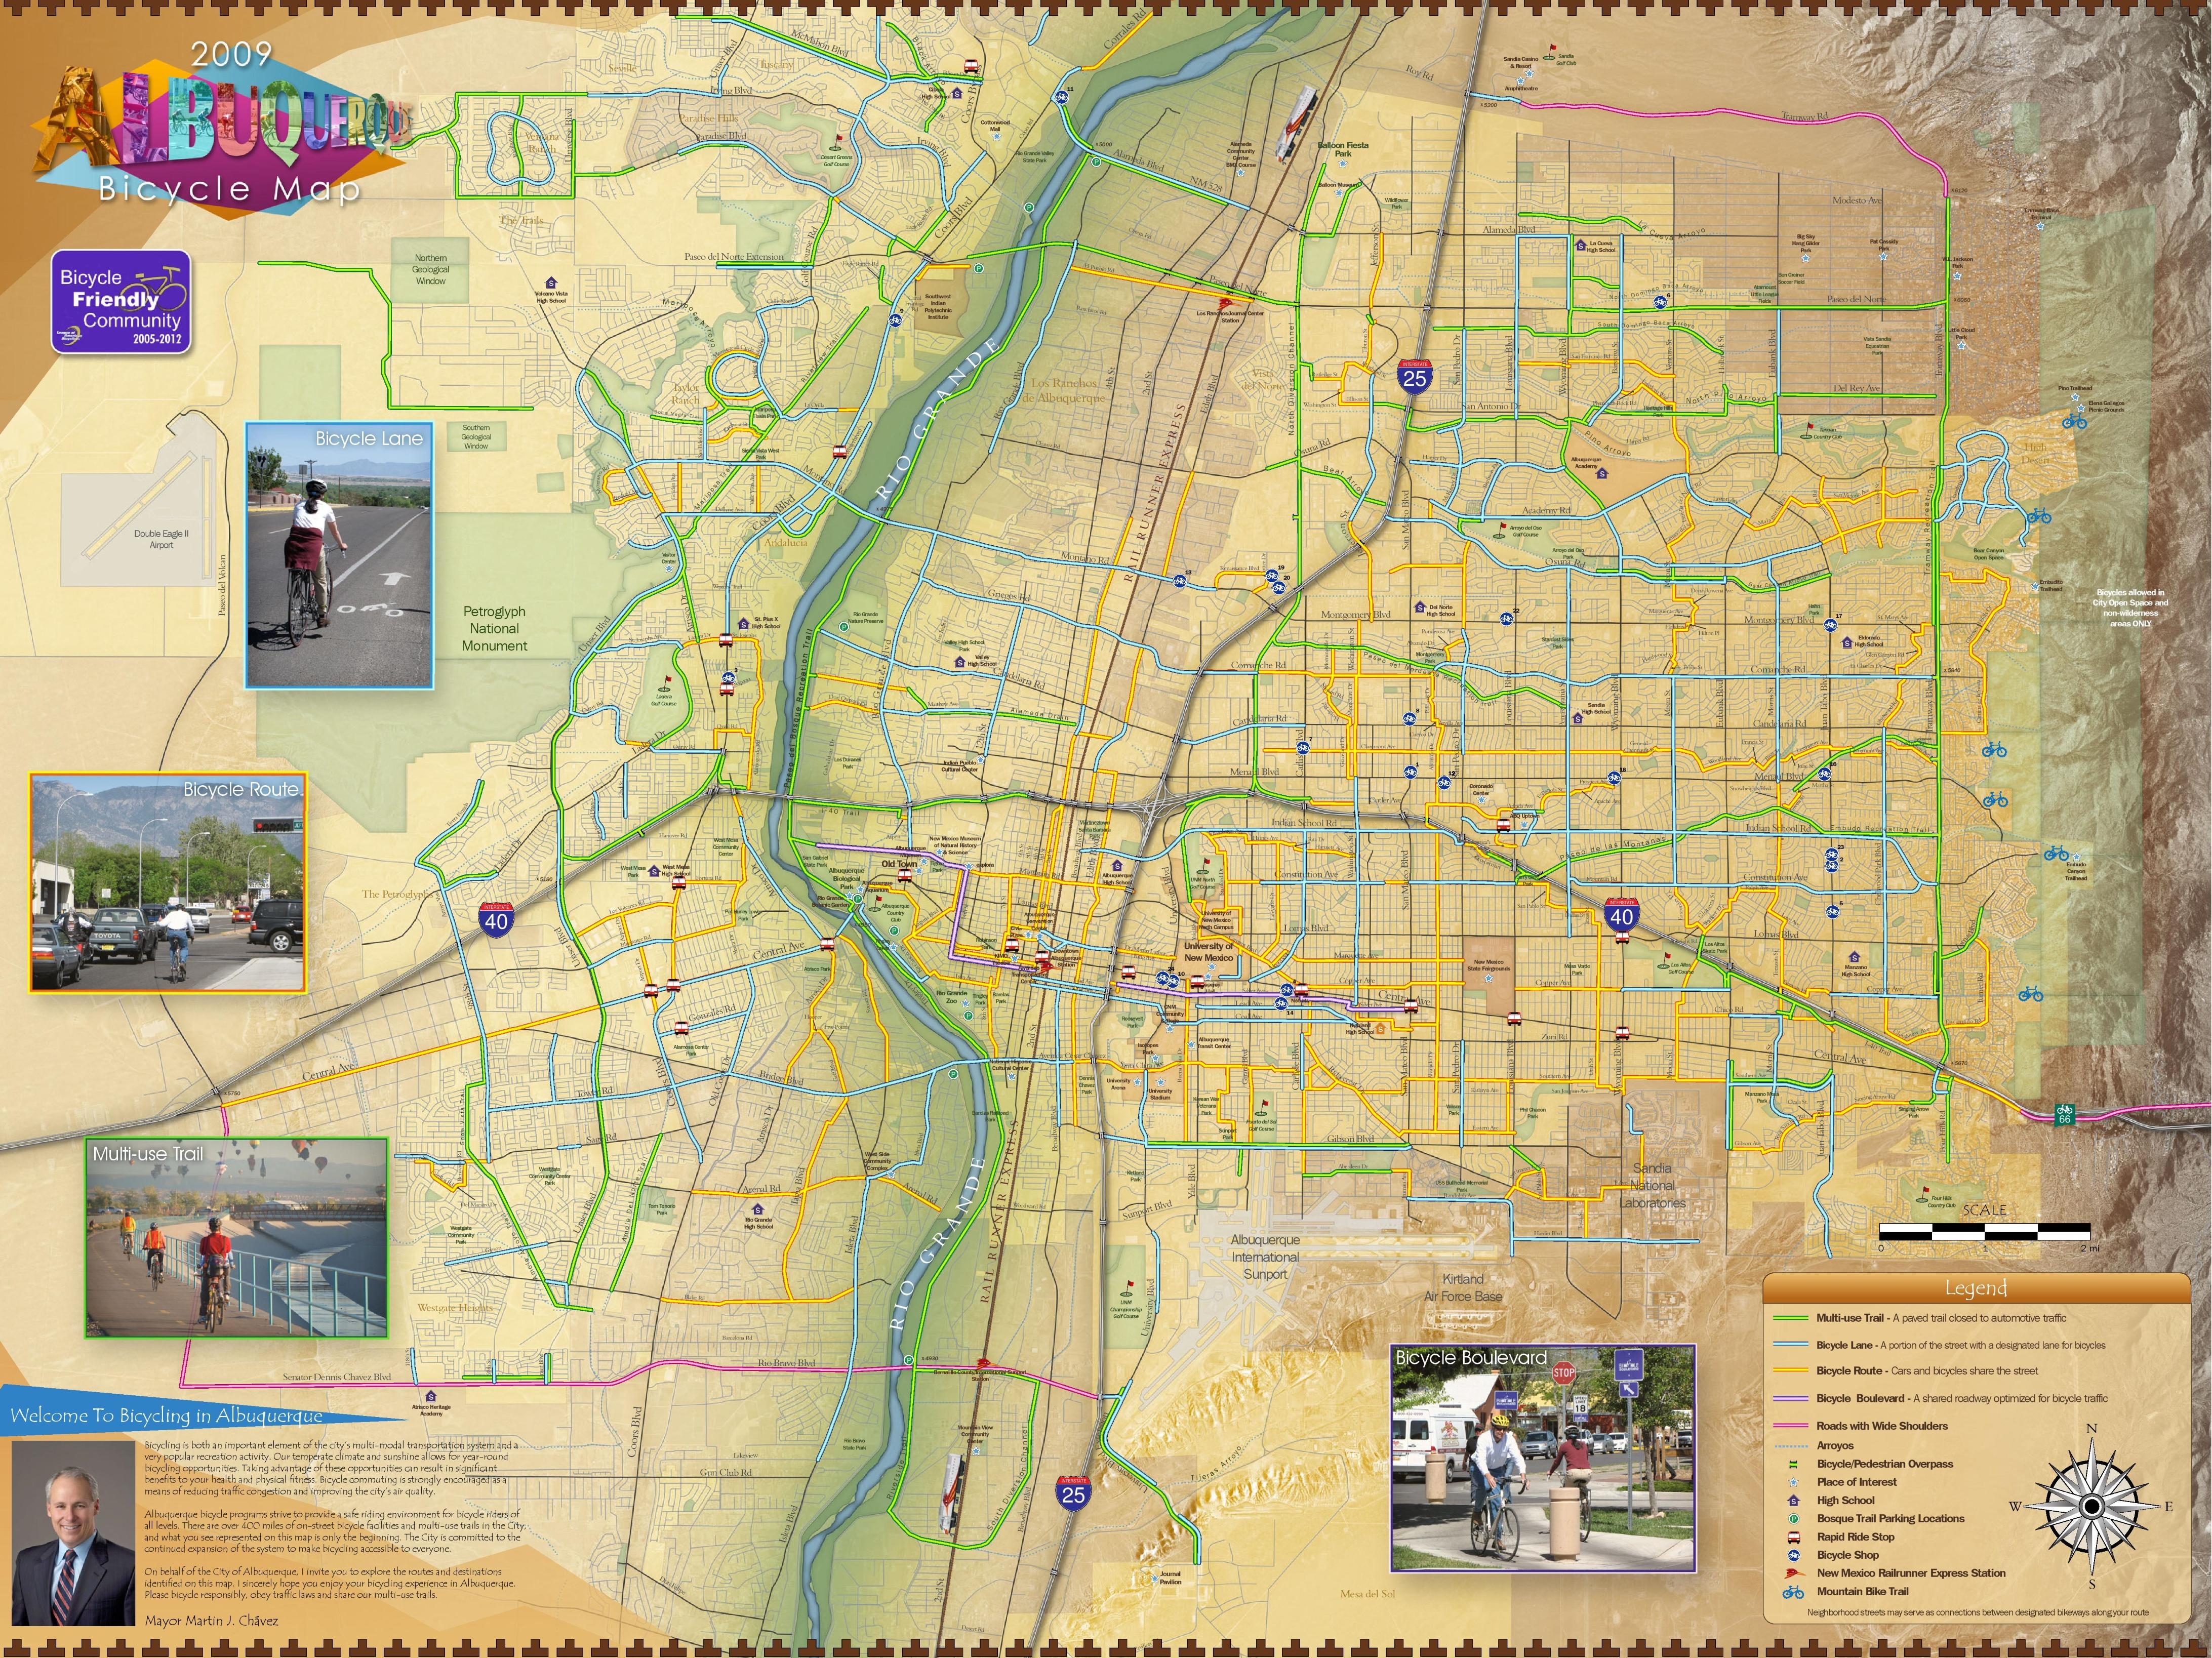 Albuquerque Bike Map - Albuquerque map